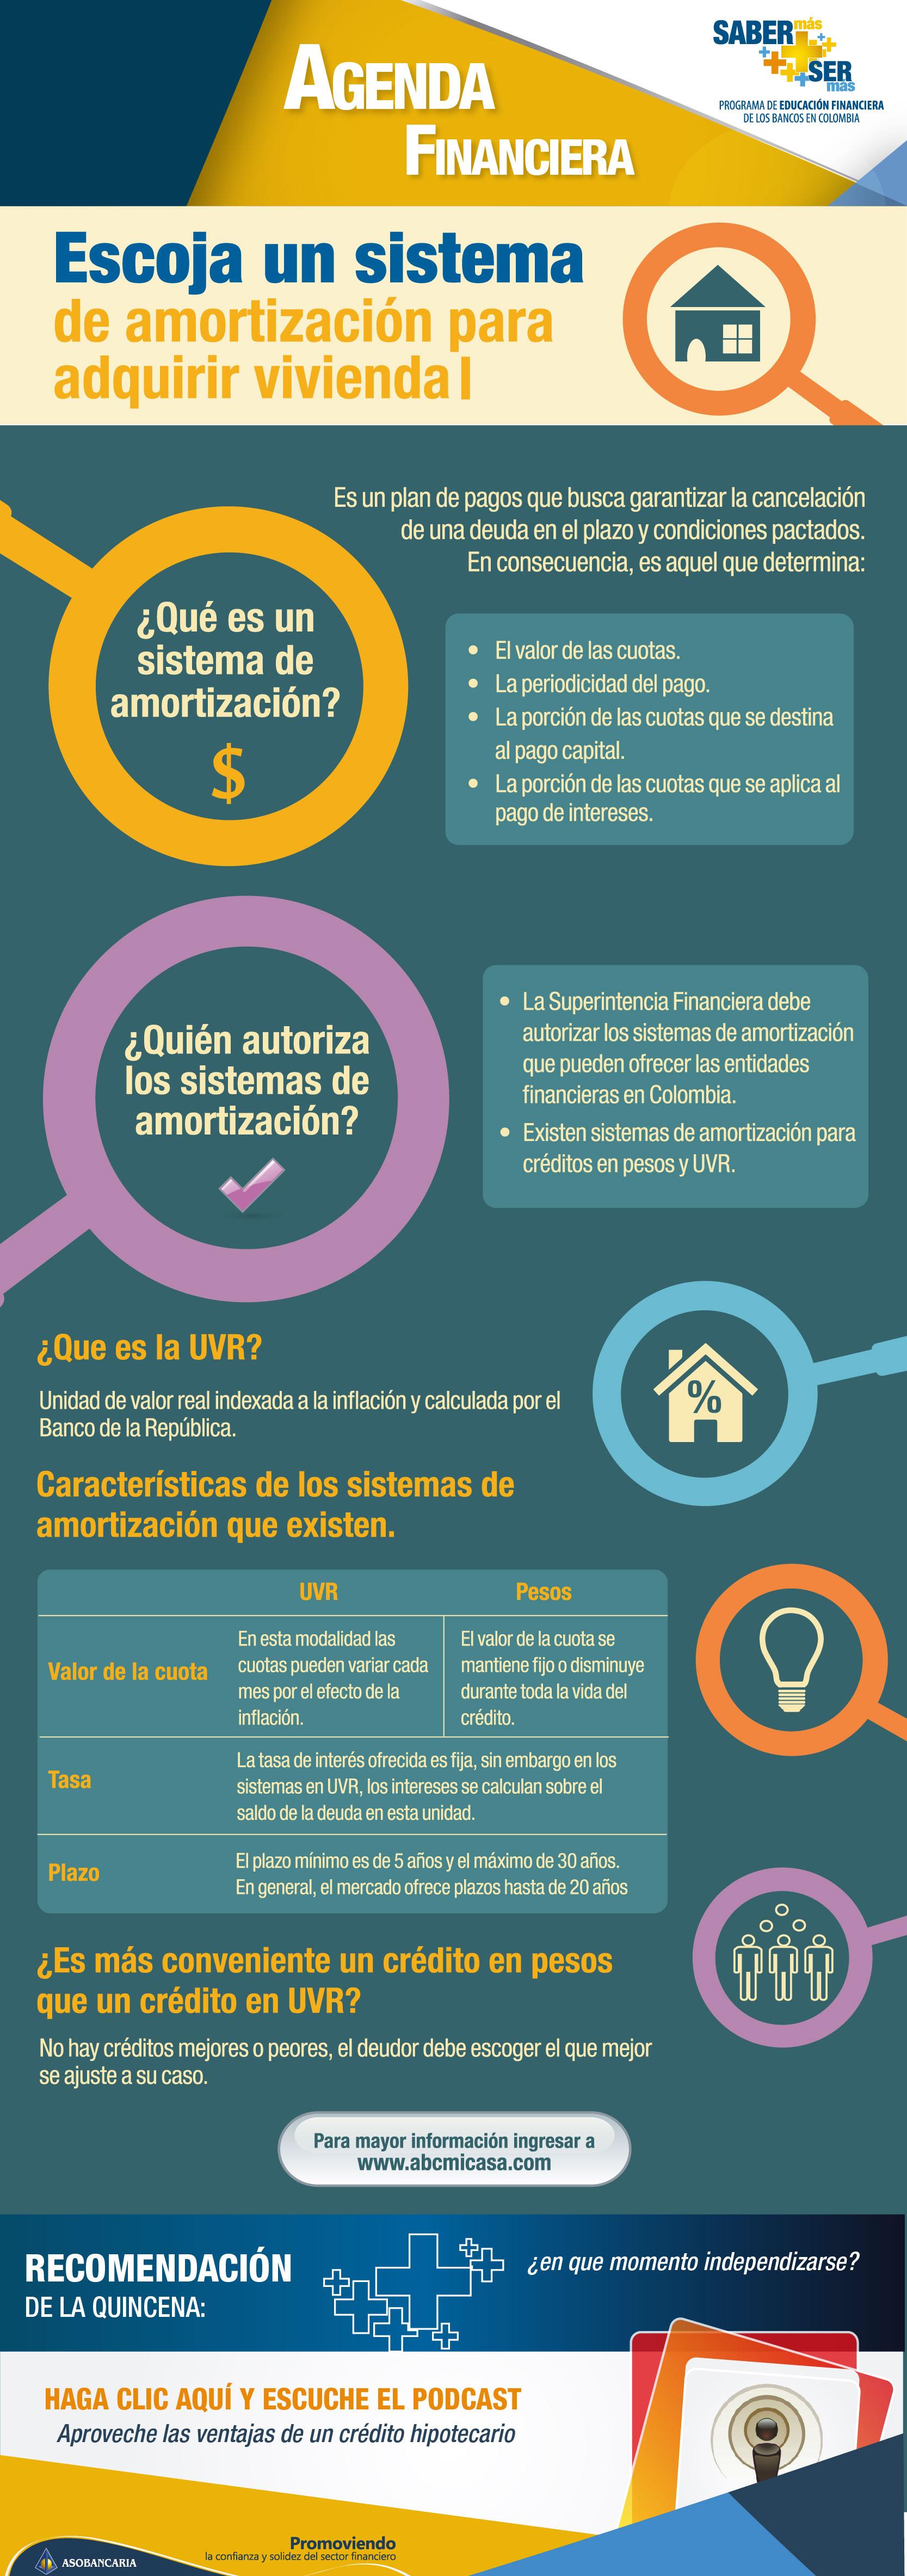 Boletin 77 - Escoja un sistema de amortizacion para adquirir vivienda I